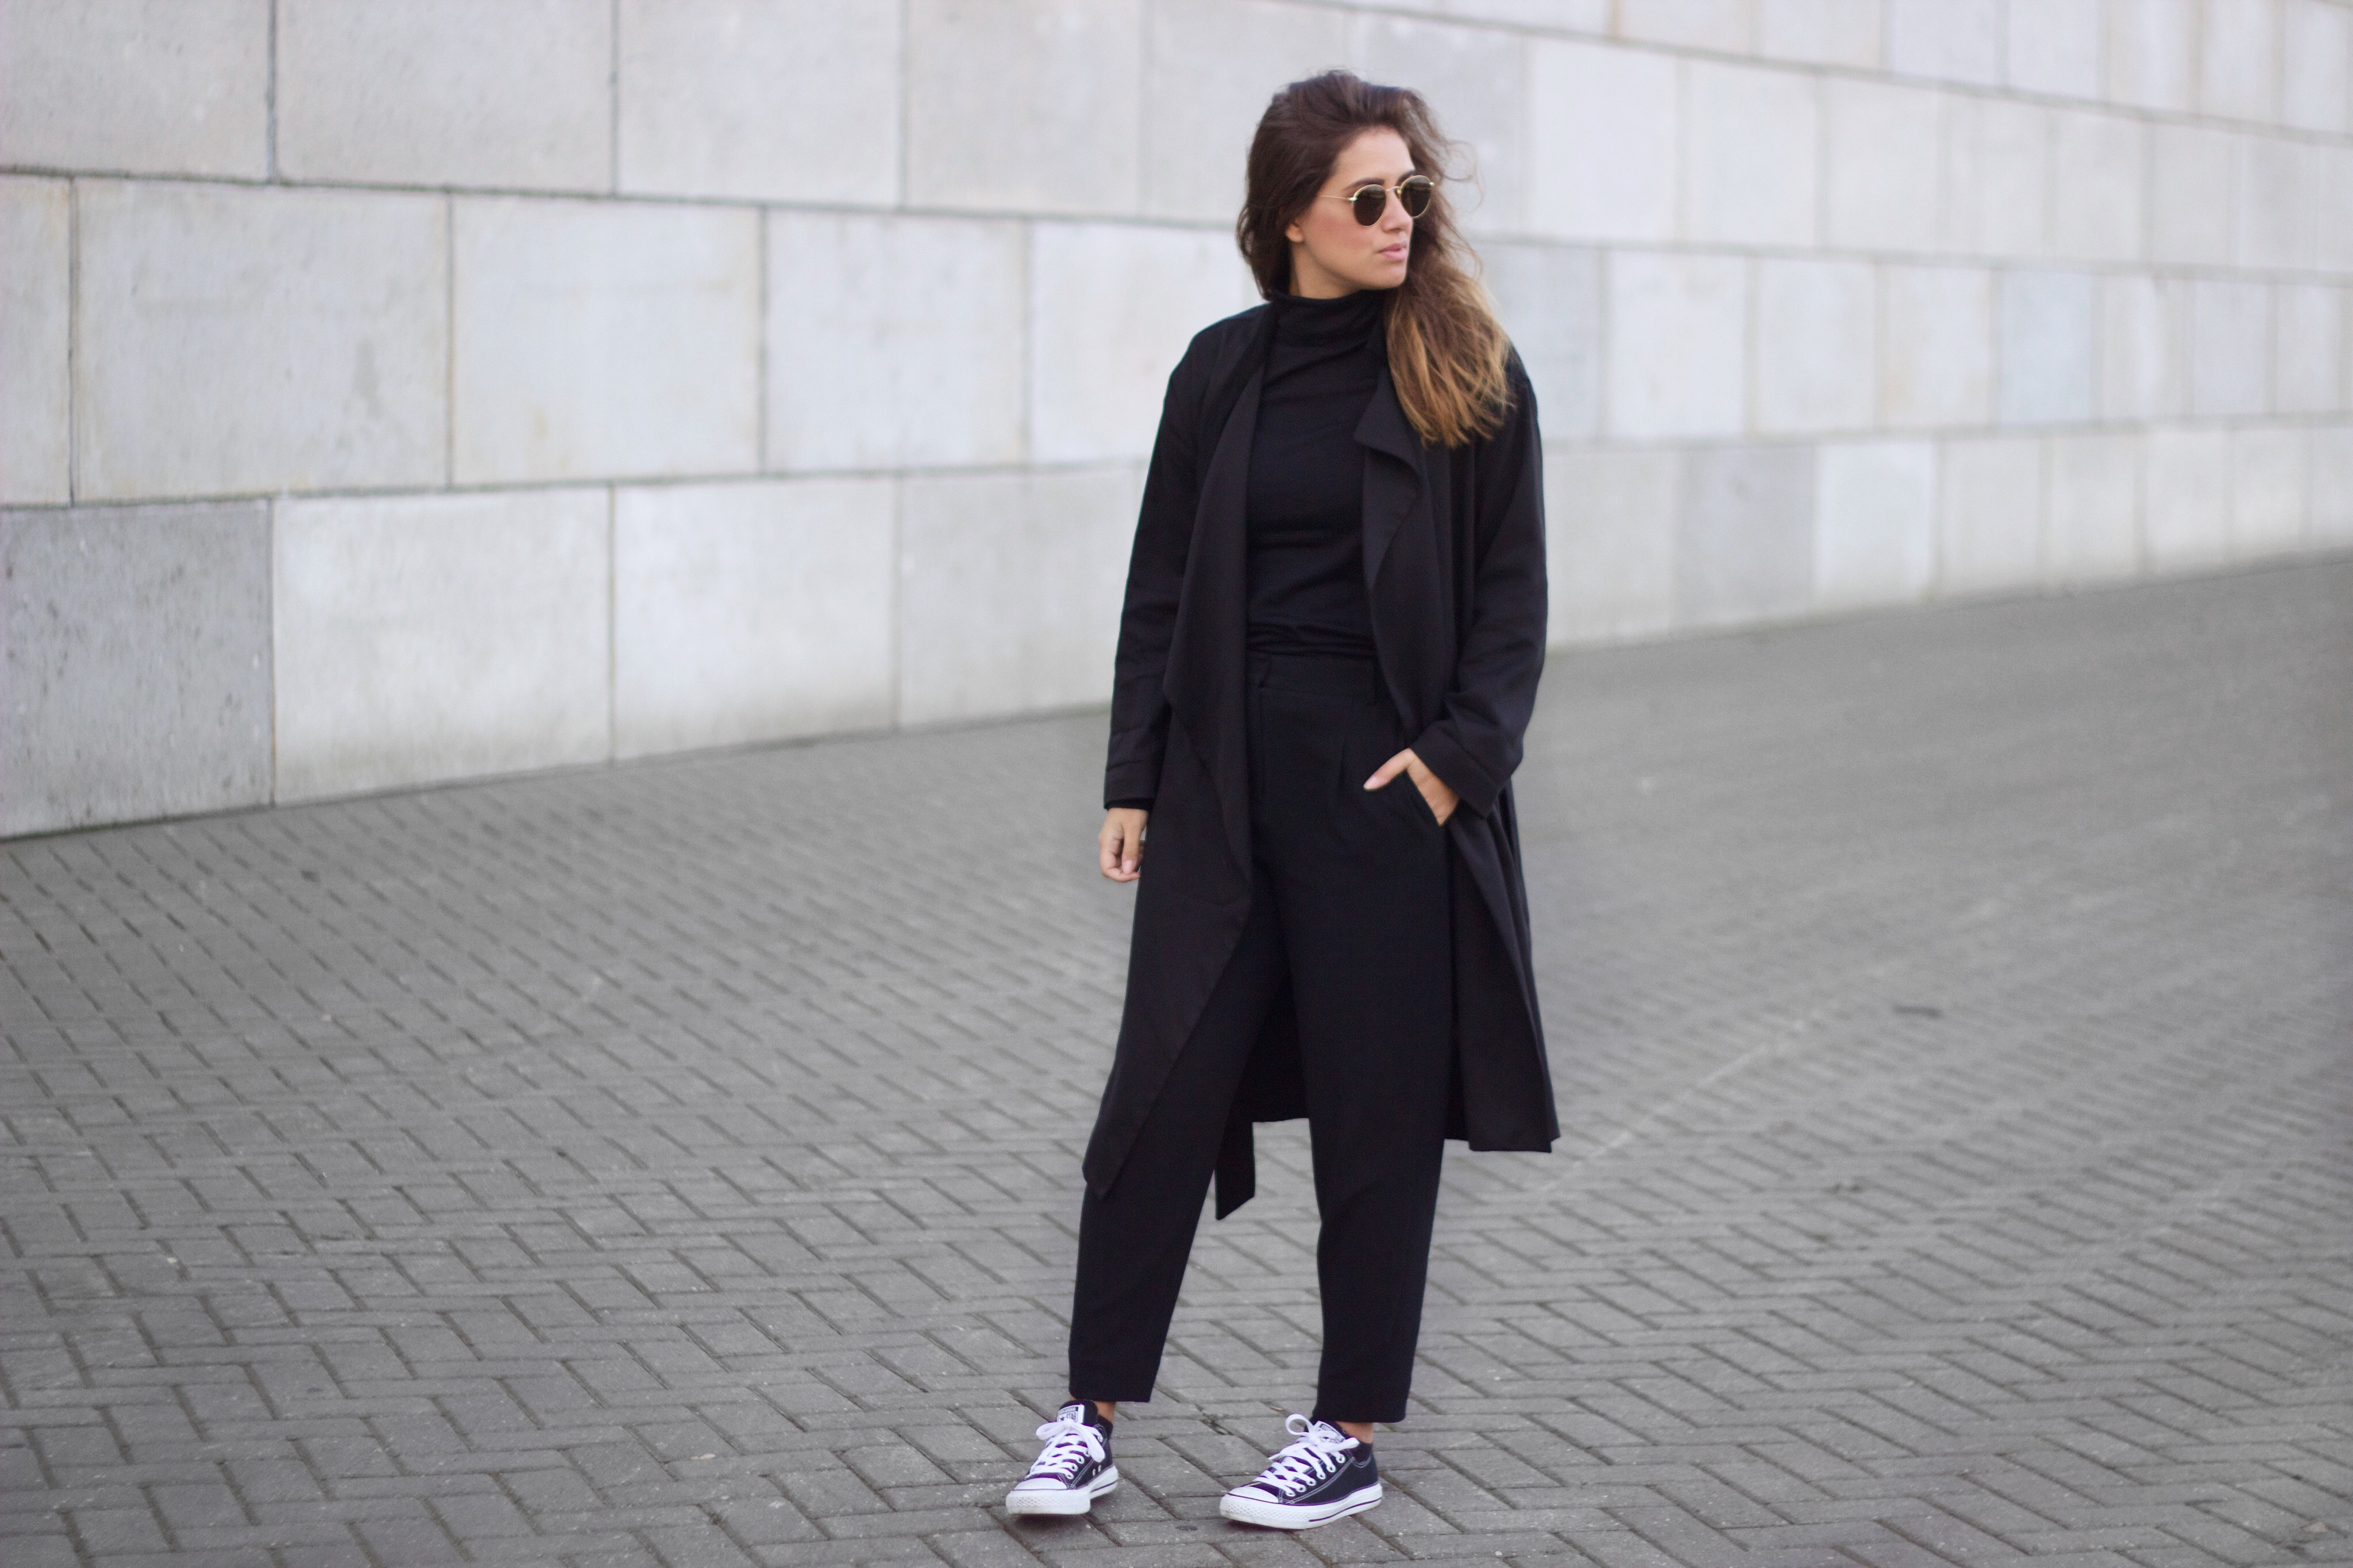 Long-coat-autumn-season-trend-black-white-simple-basic